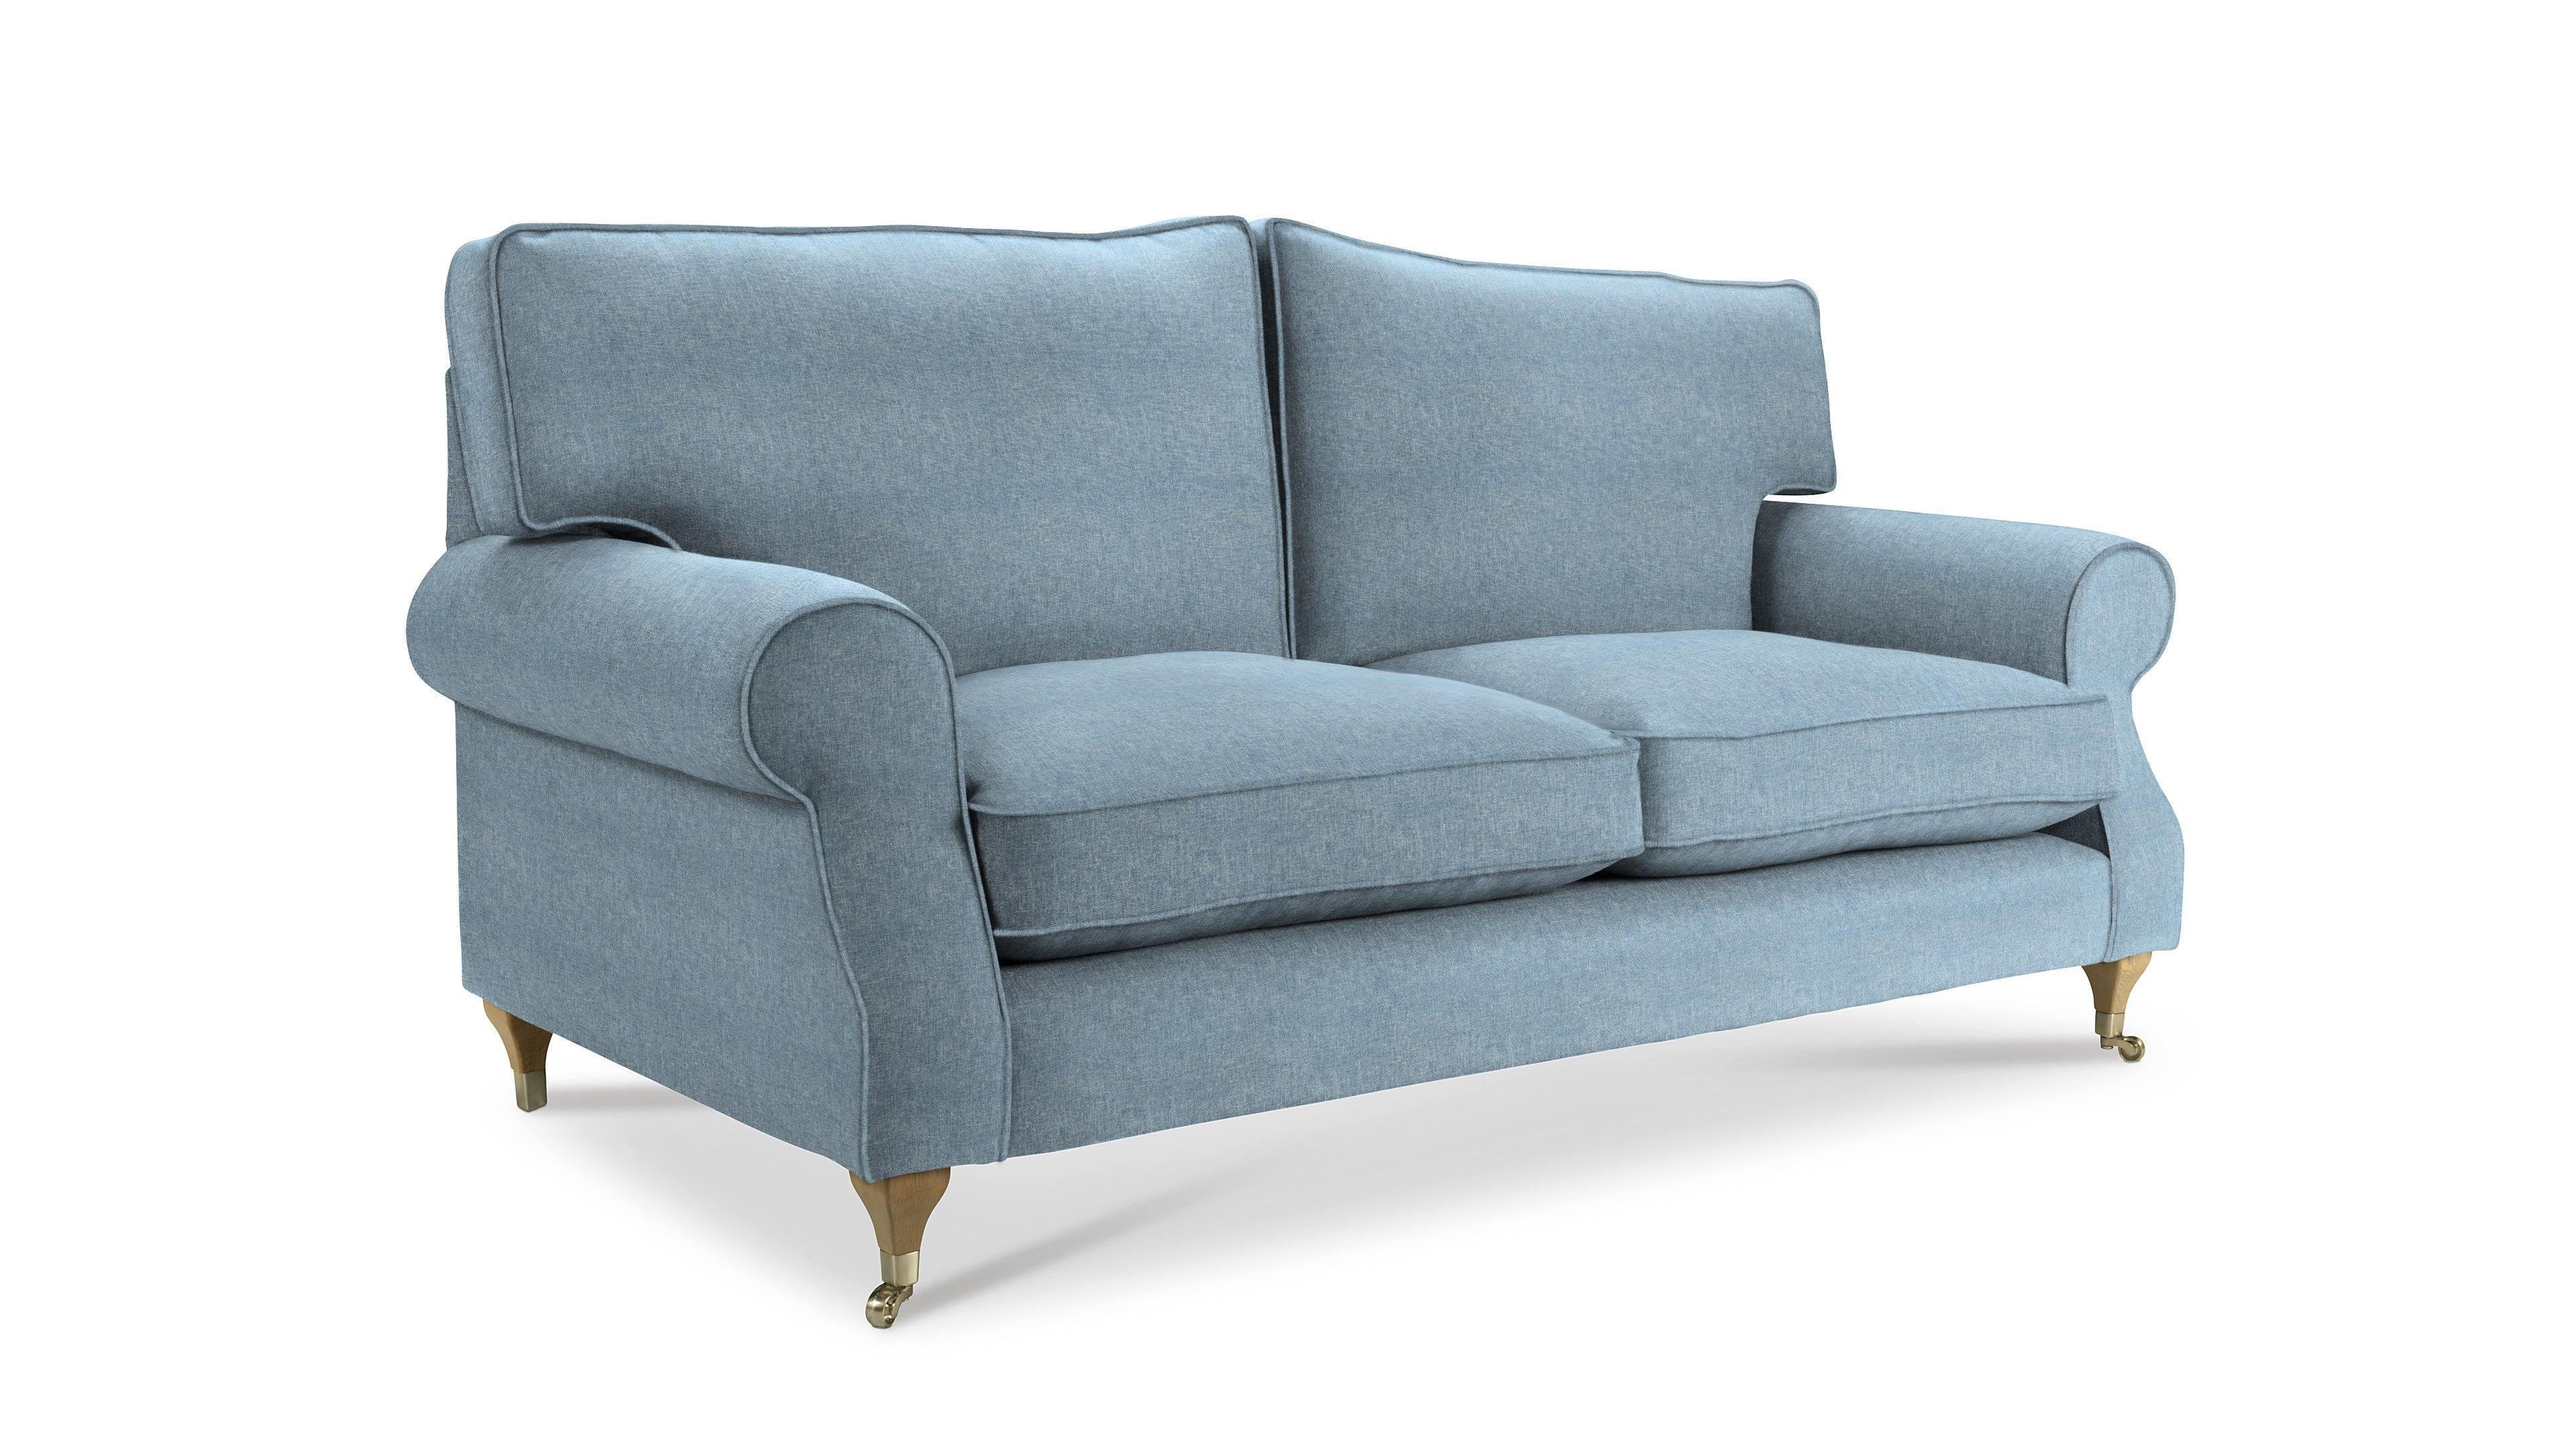 denim sofas uk the best sectional mollie small sofa shop4sofas